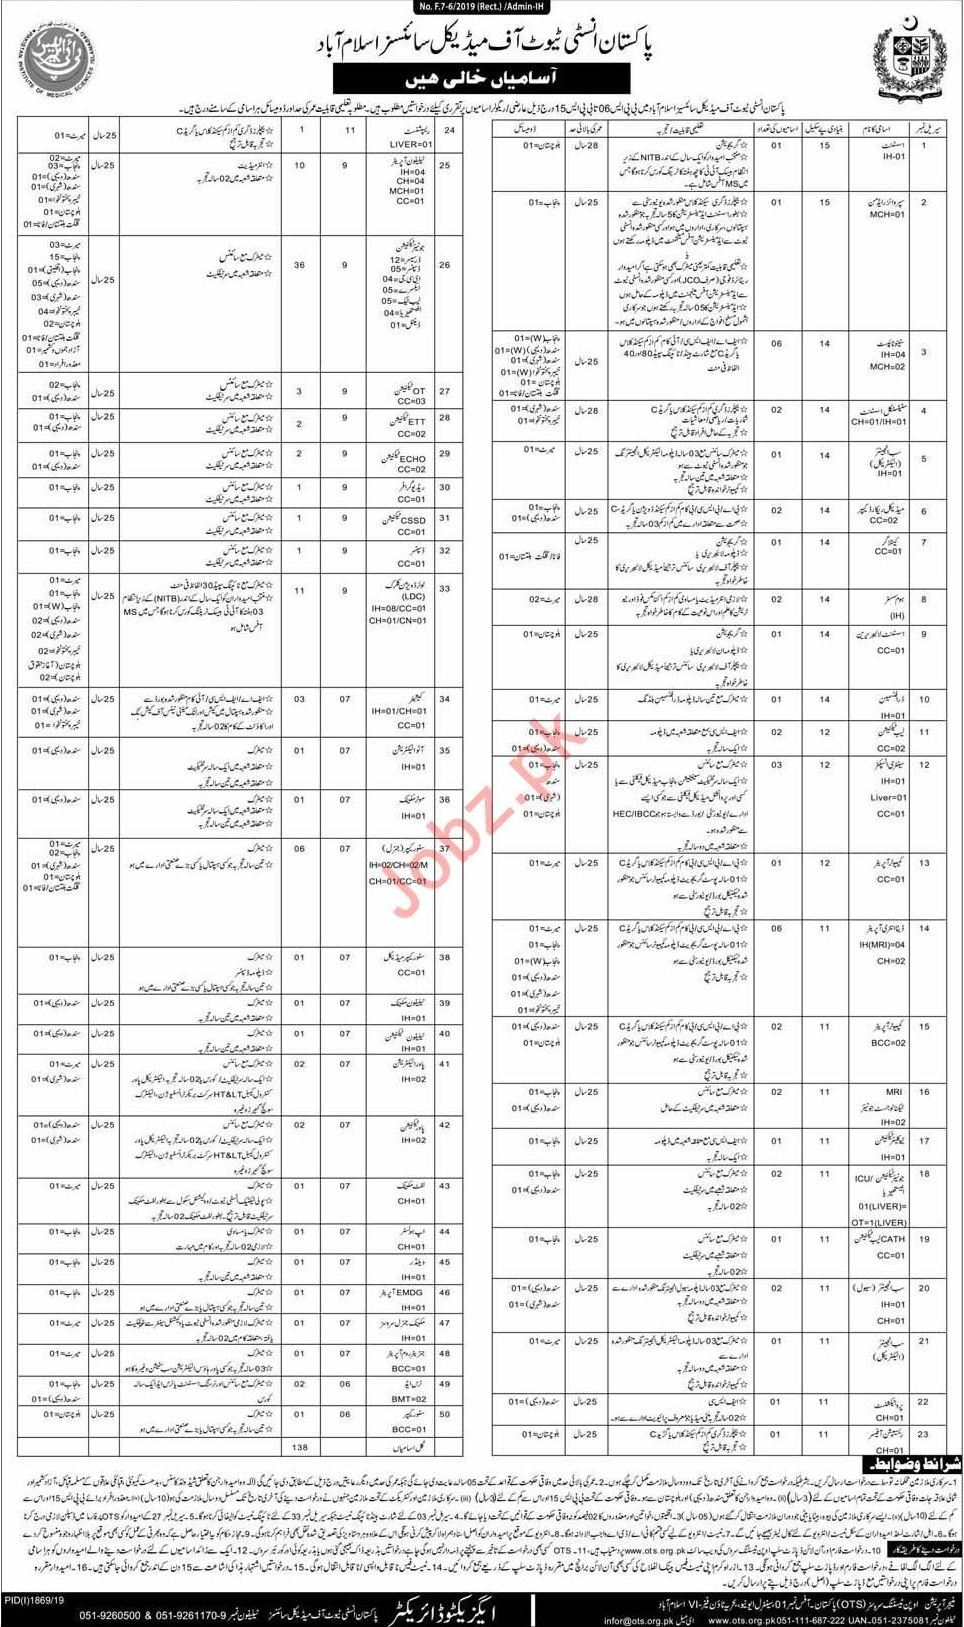 Pakistan Institute of Medical Sciences PIMS Jobs via OTS